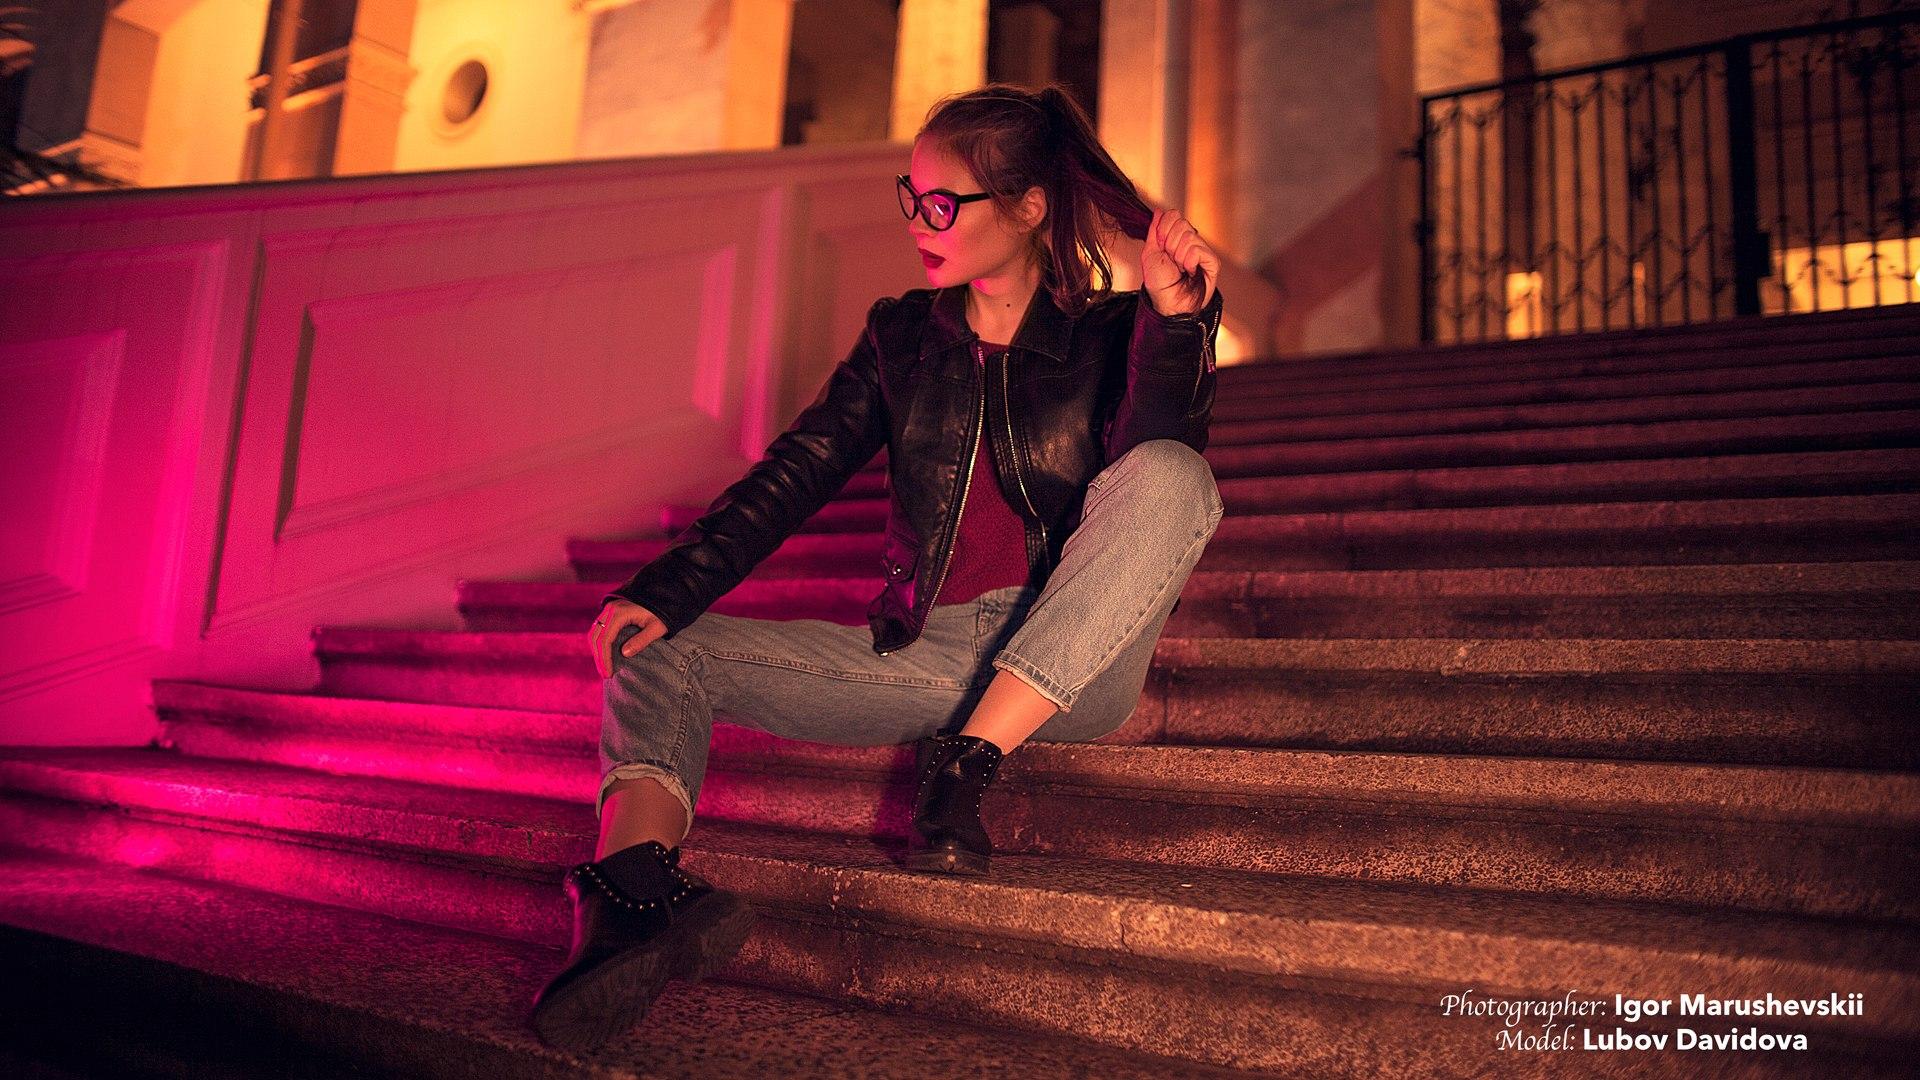 People 1920x1080 Igor Marushevskii  stairs women with glasses women outdoors urban sitting women Lyubov Davidova brunette